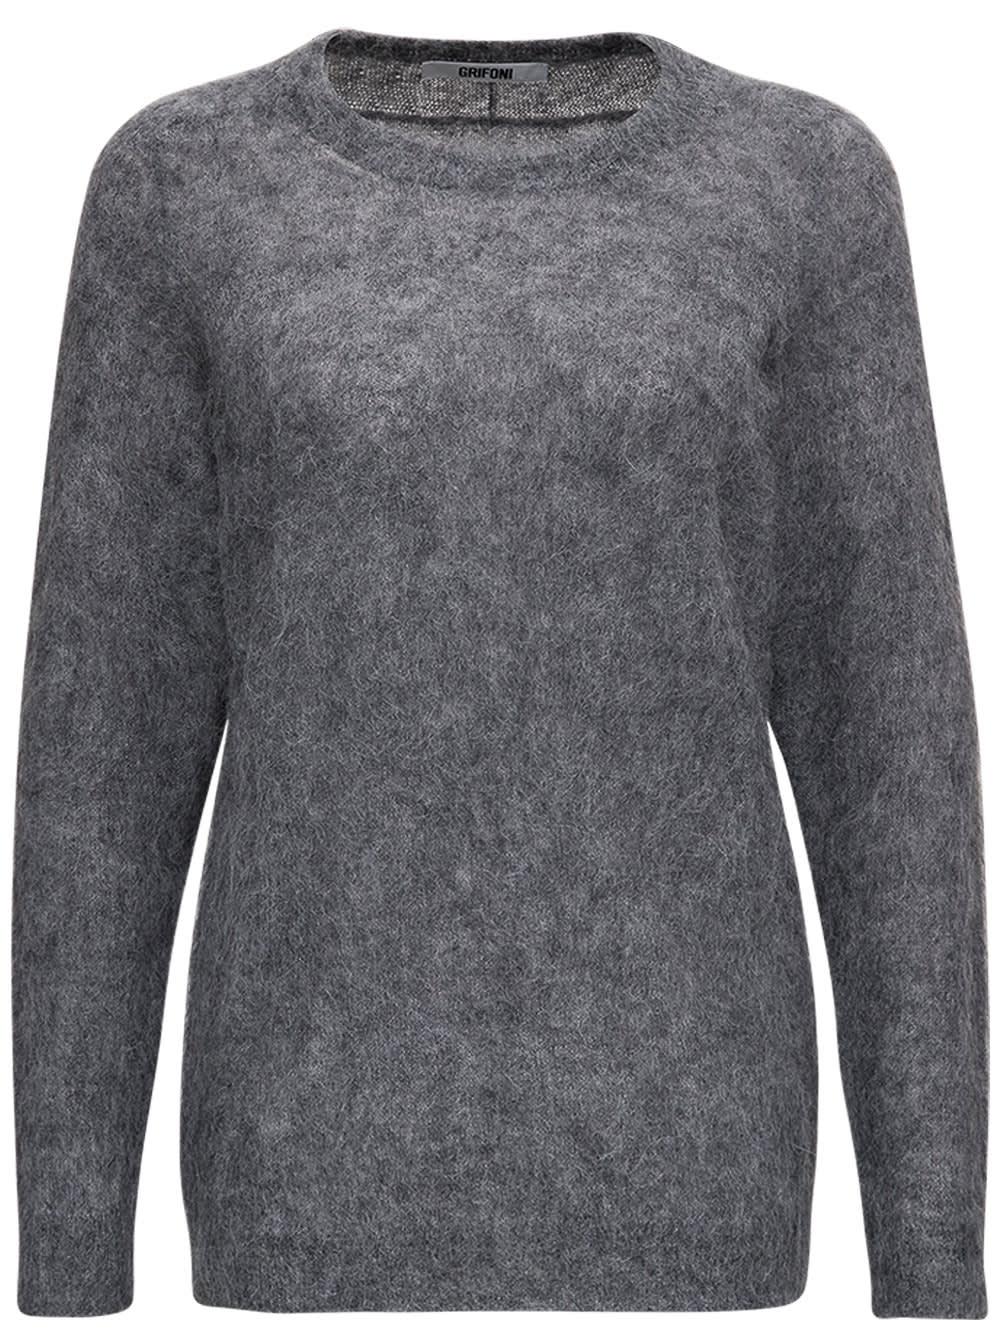 Grey Mohair Sweater